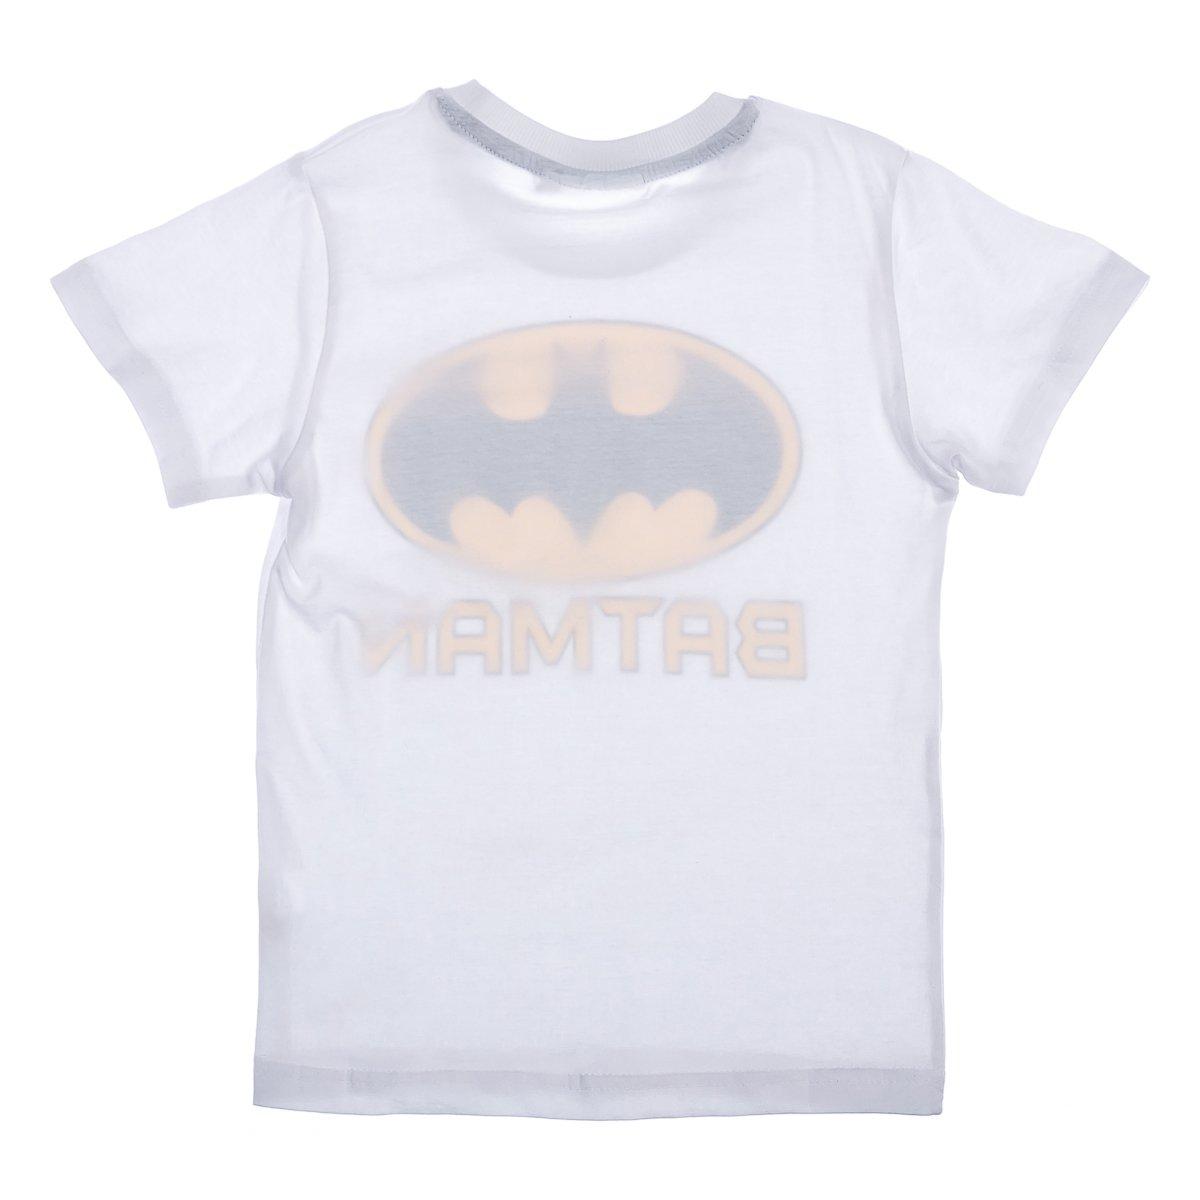 Купить Футболки, майки, топы, туники, Футболка E Plus M Batman White, р. 152 BAT5202184 ТМ: E Plus M, белый